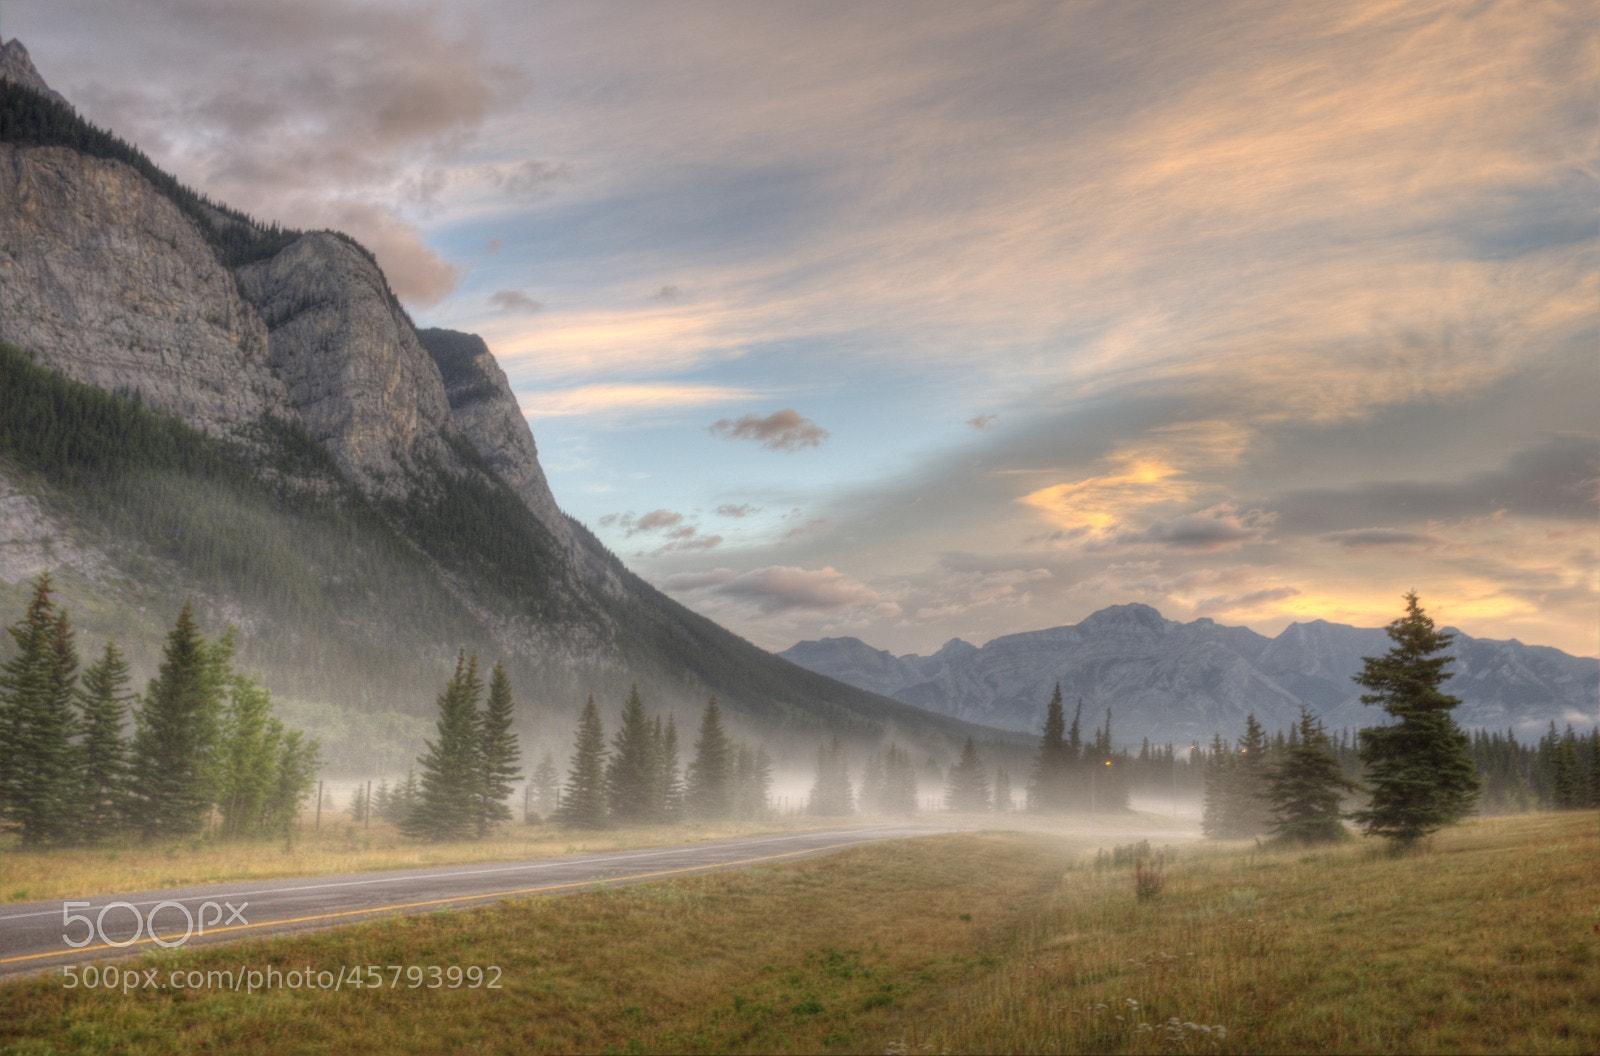 Photograph Foggy morning in Canadian Rockies by Svetlana Golovko on 500px